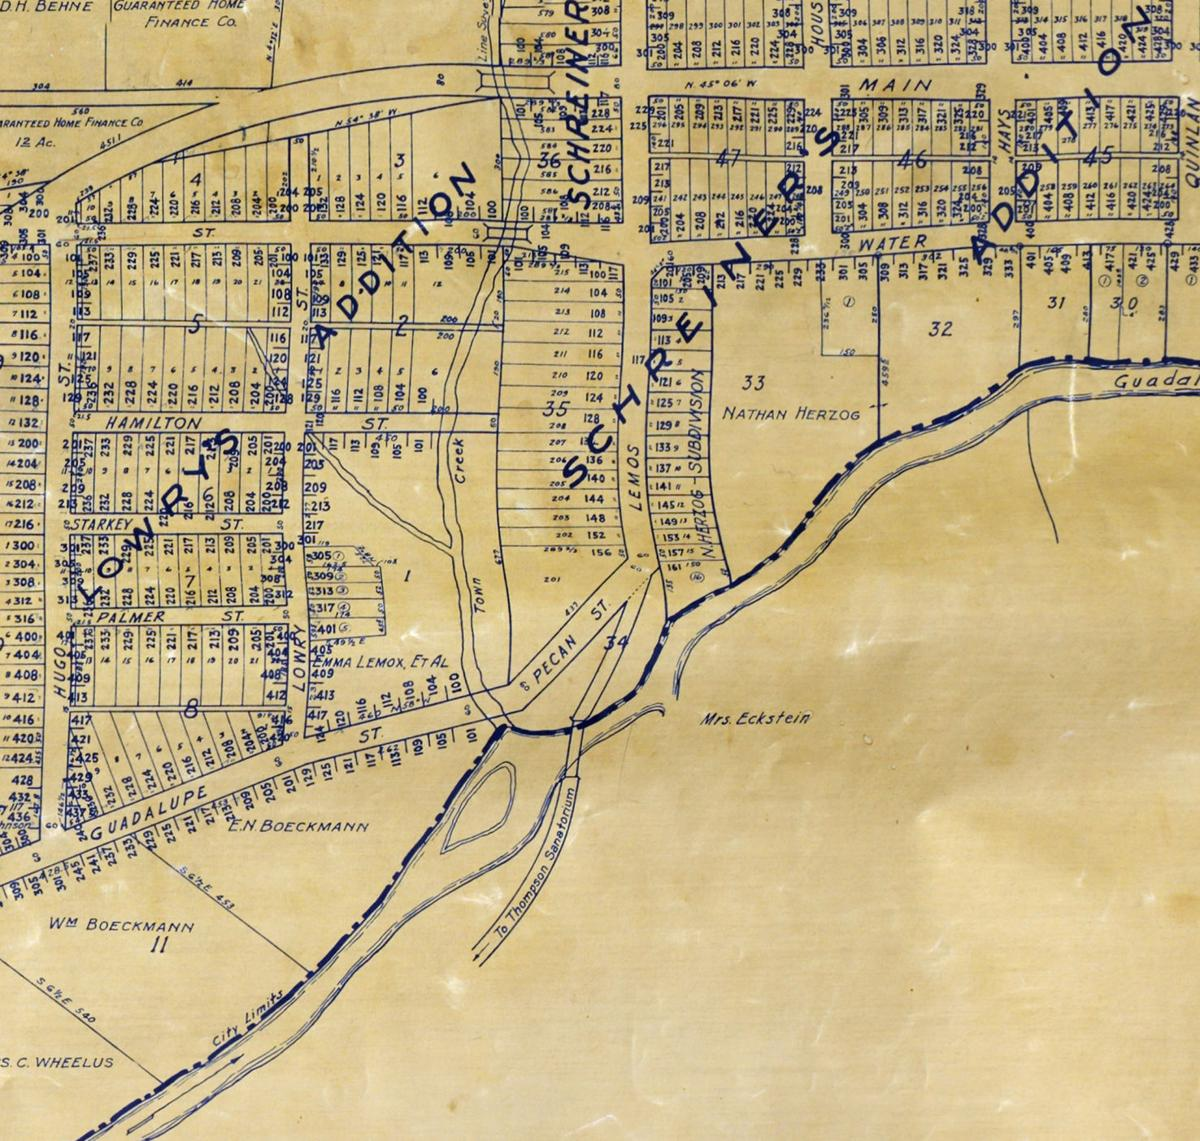 Detail, Lemos St and Guadalupe Crossing, 1934.jpg